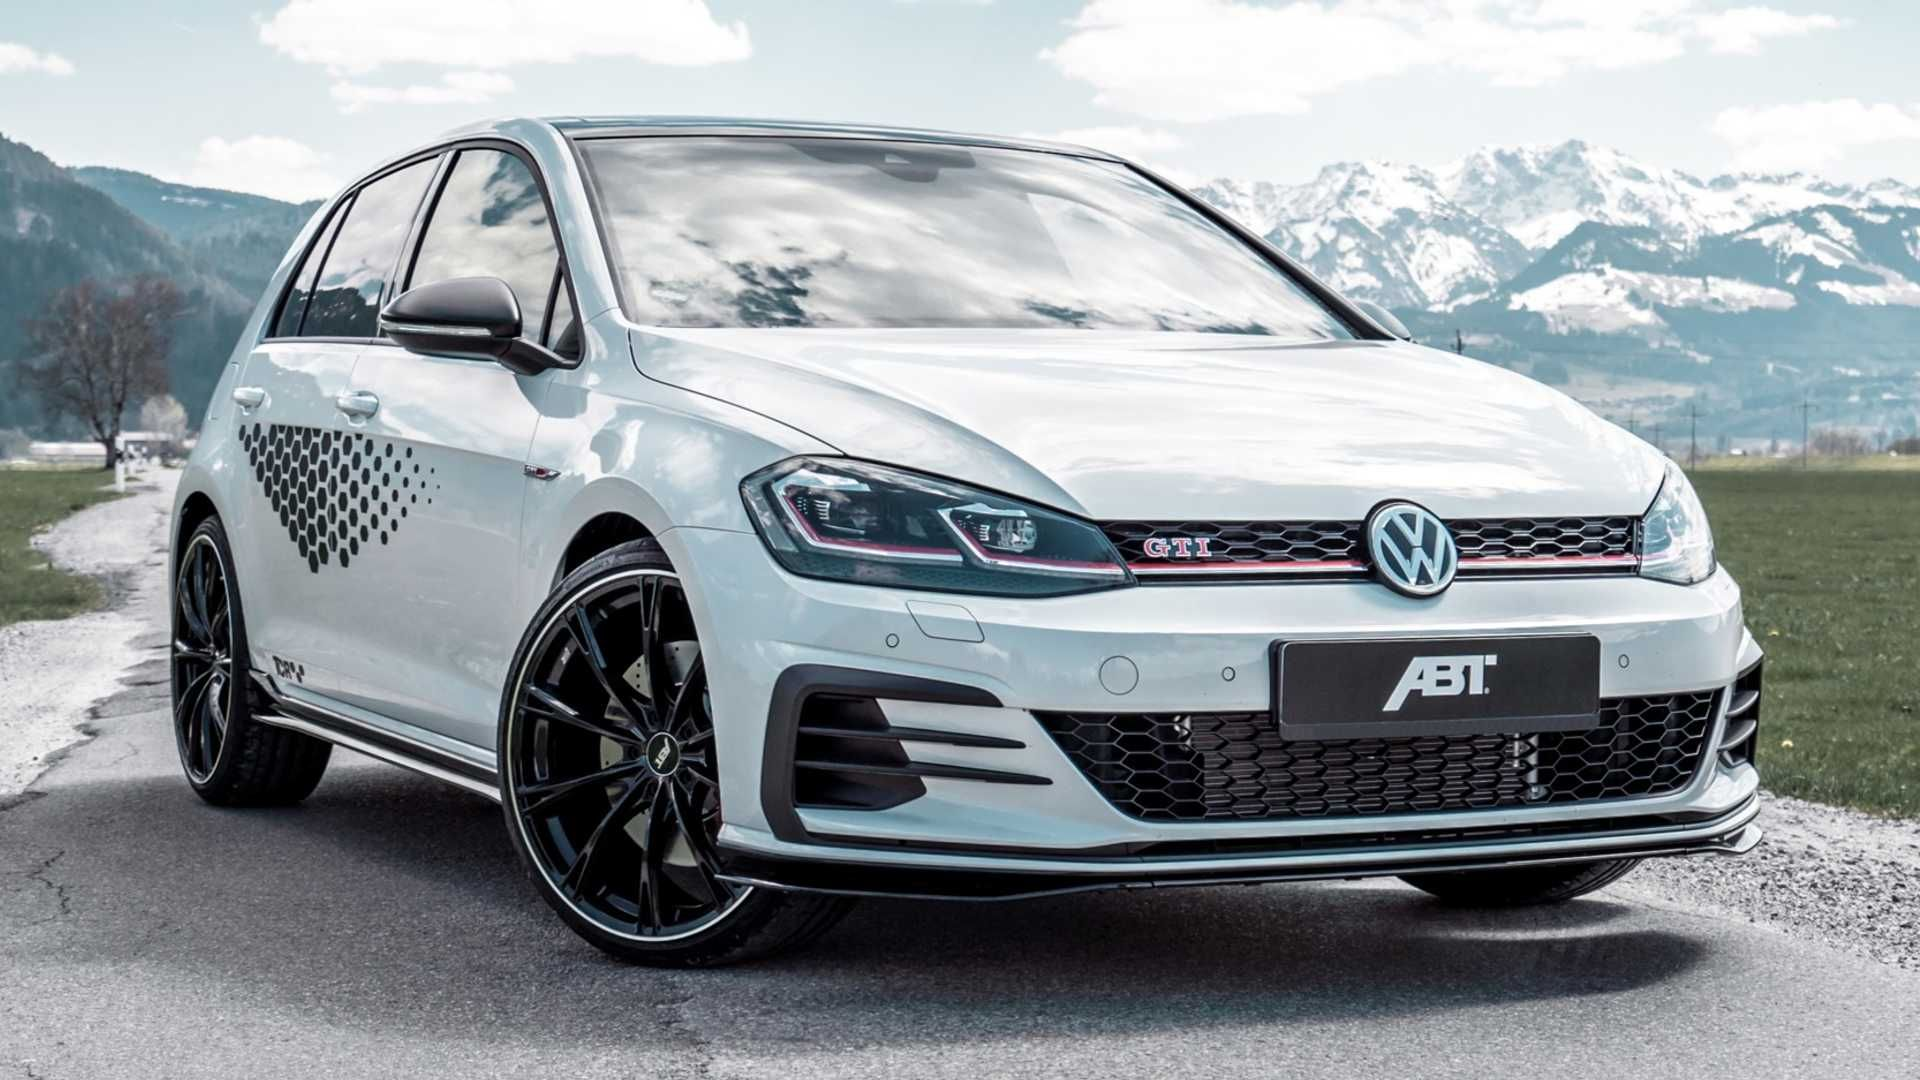 Vw Golf Gti Tcr Already Ramped Up To 335 Hp 250 Kw By Abt Golf Gti Vw Golf Gti